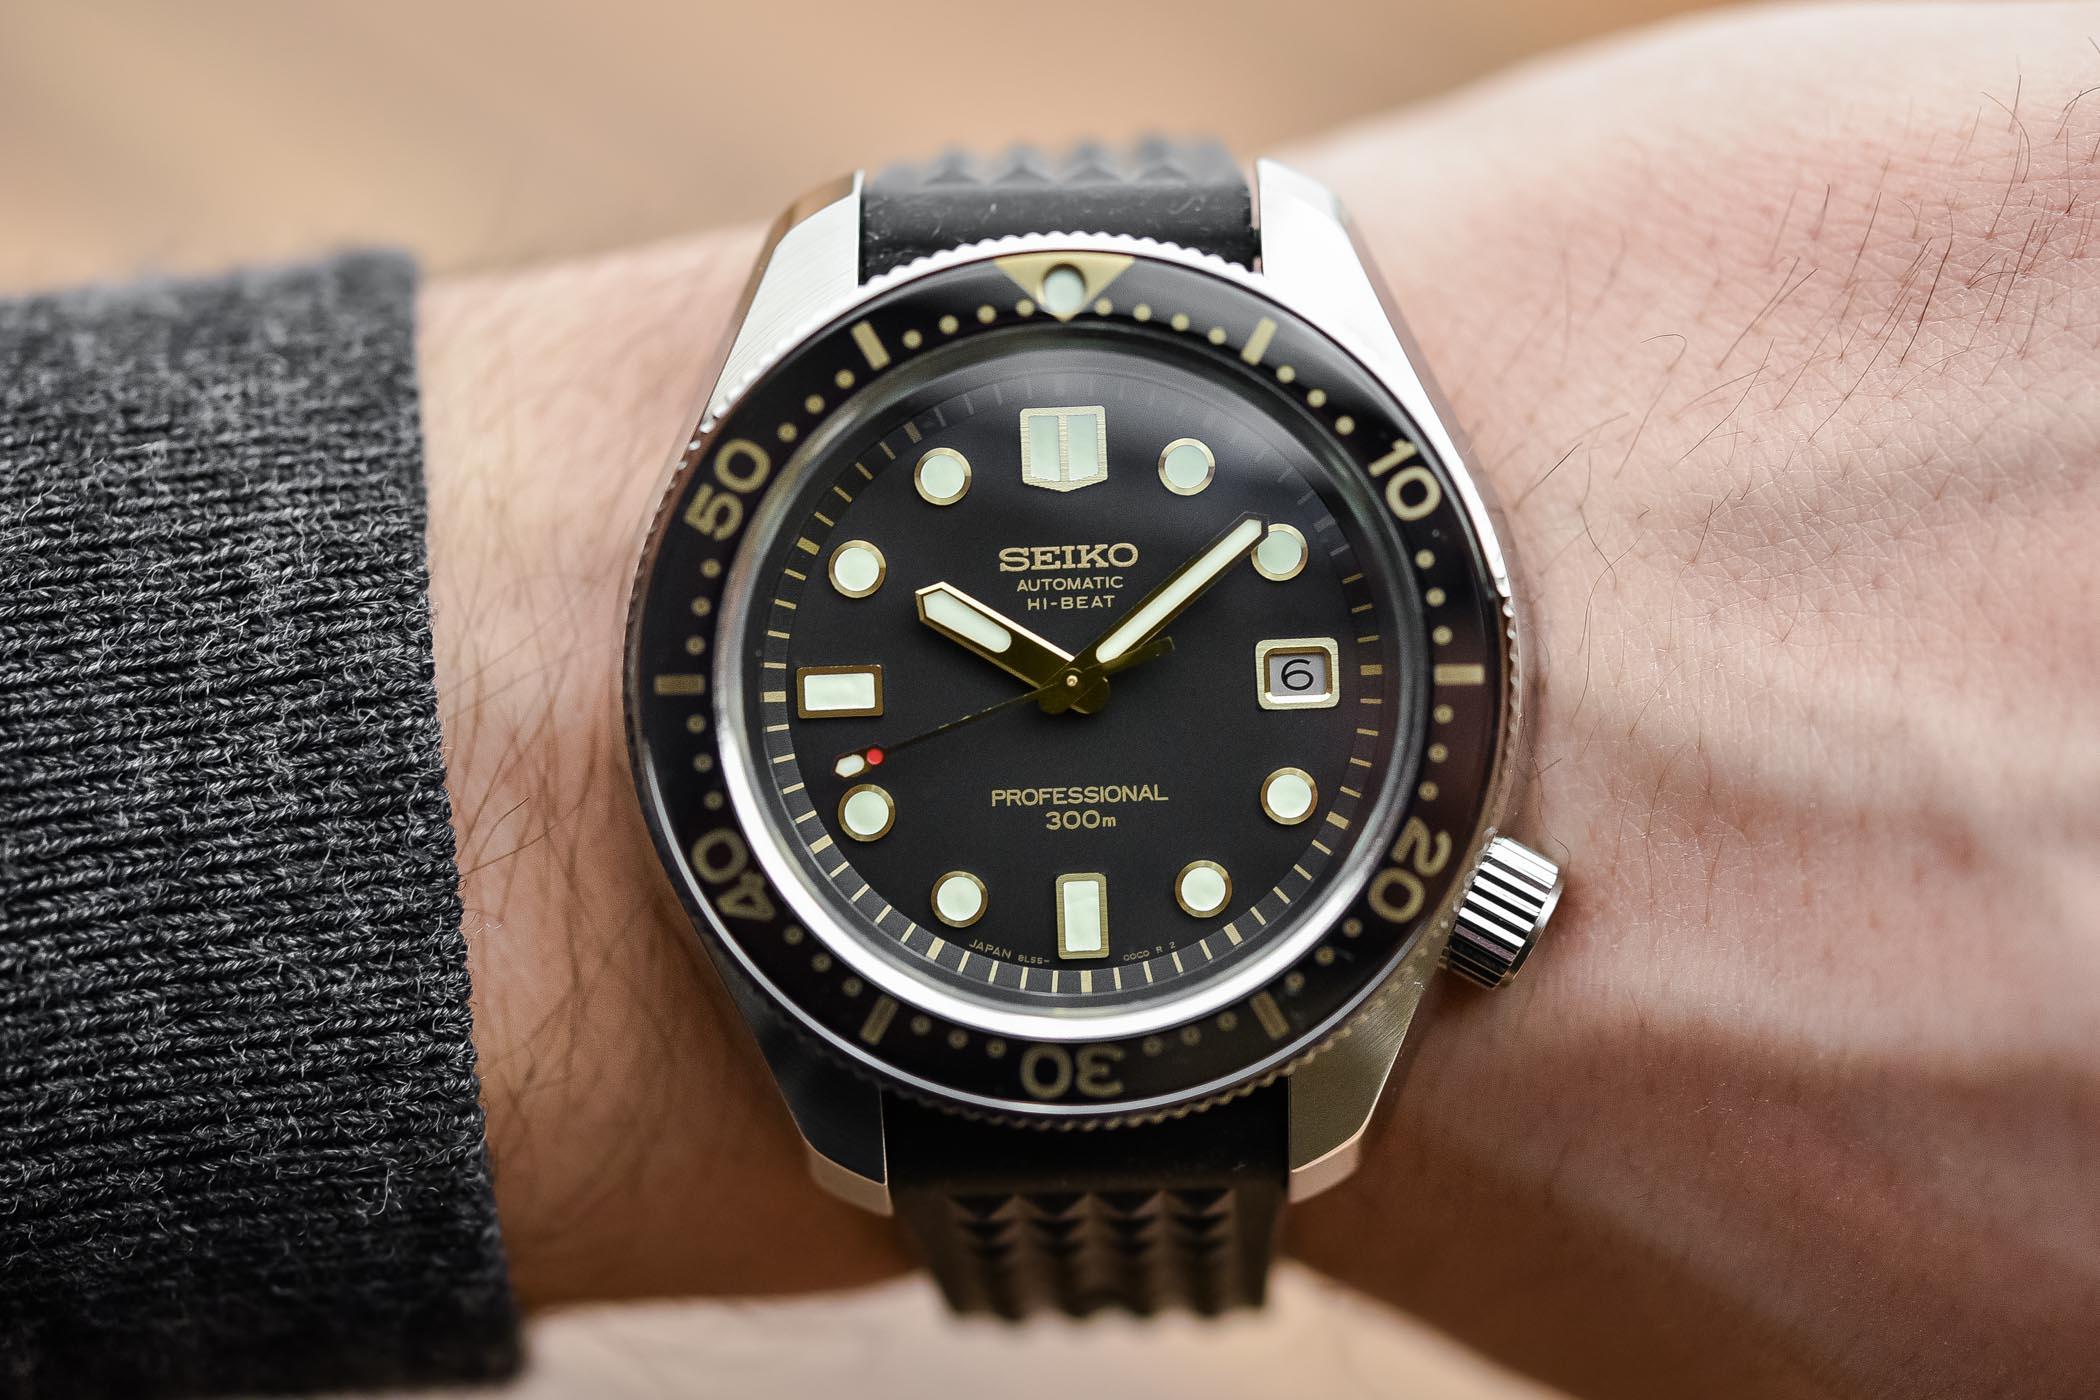 Seiko Prospex Diver 300m Hi-Beat SLA025 – Recreation 1968 Ref. 6159-7001